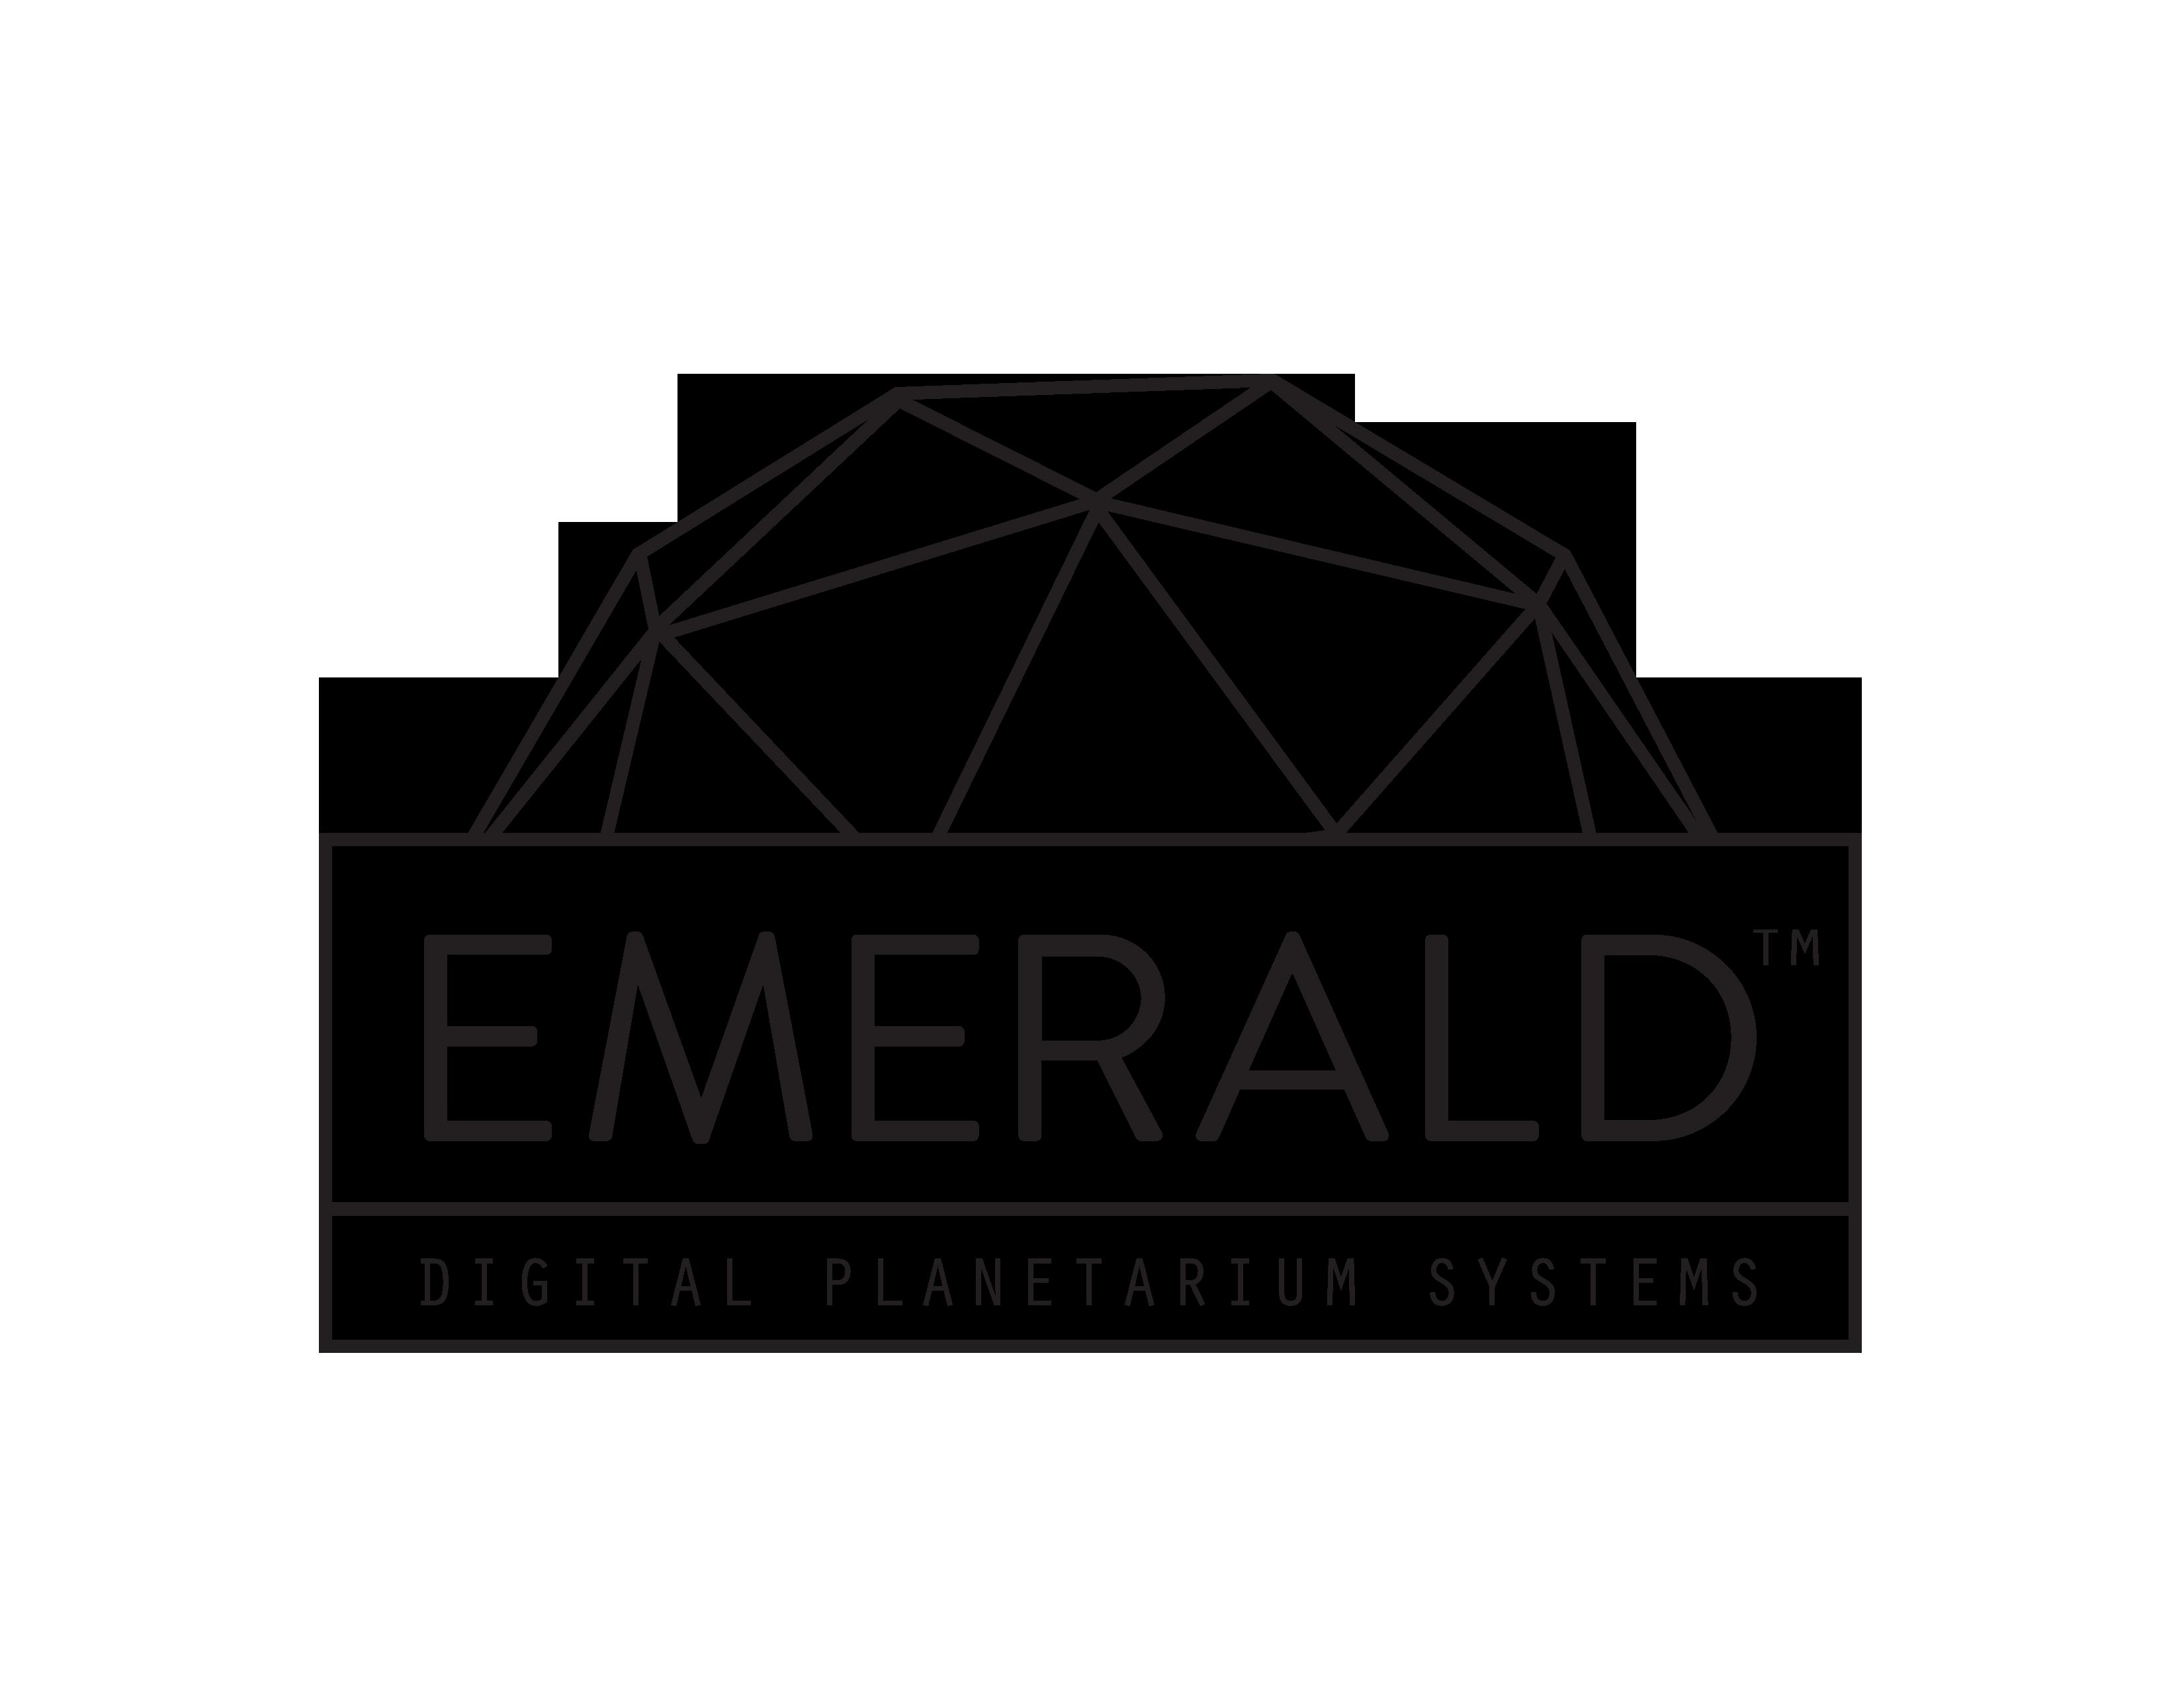 emerald logo white border